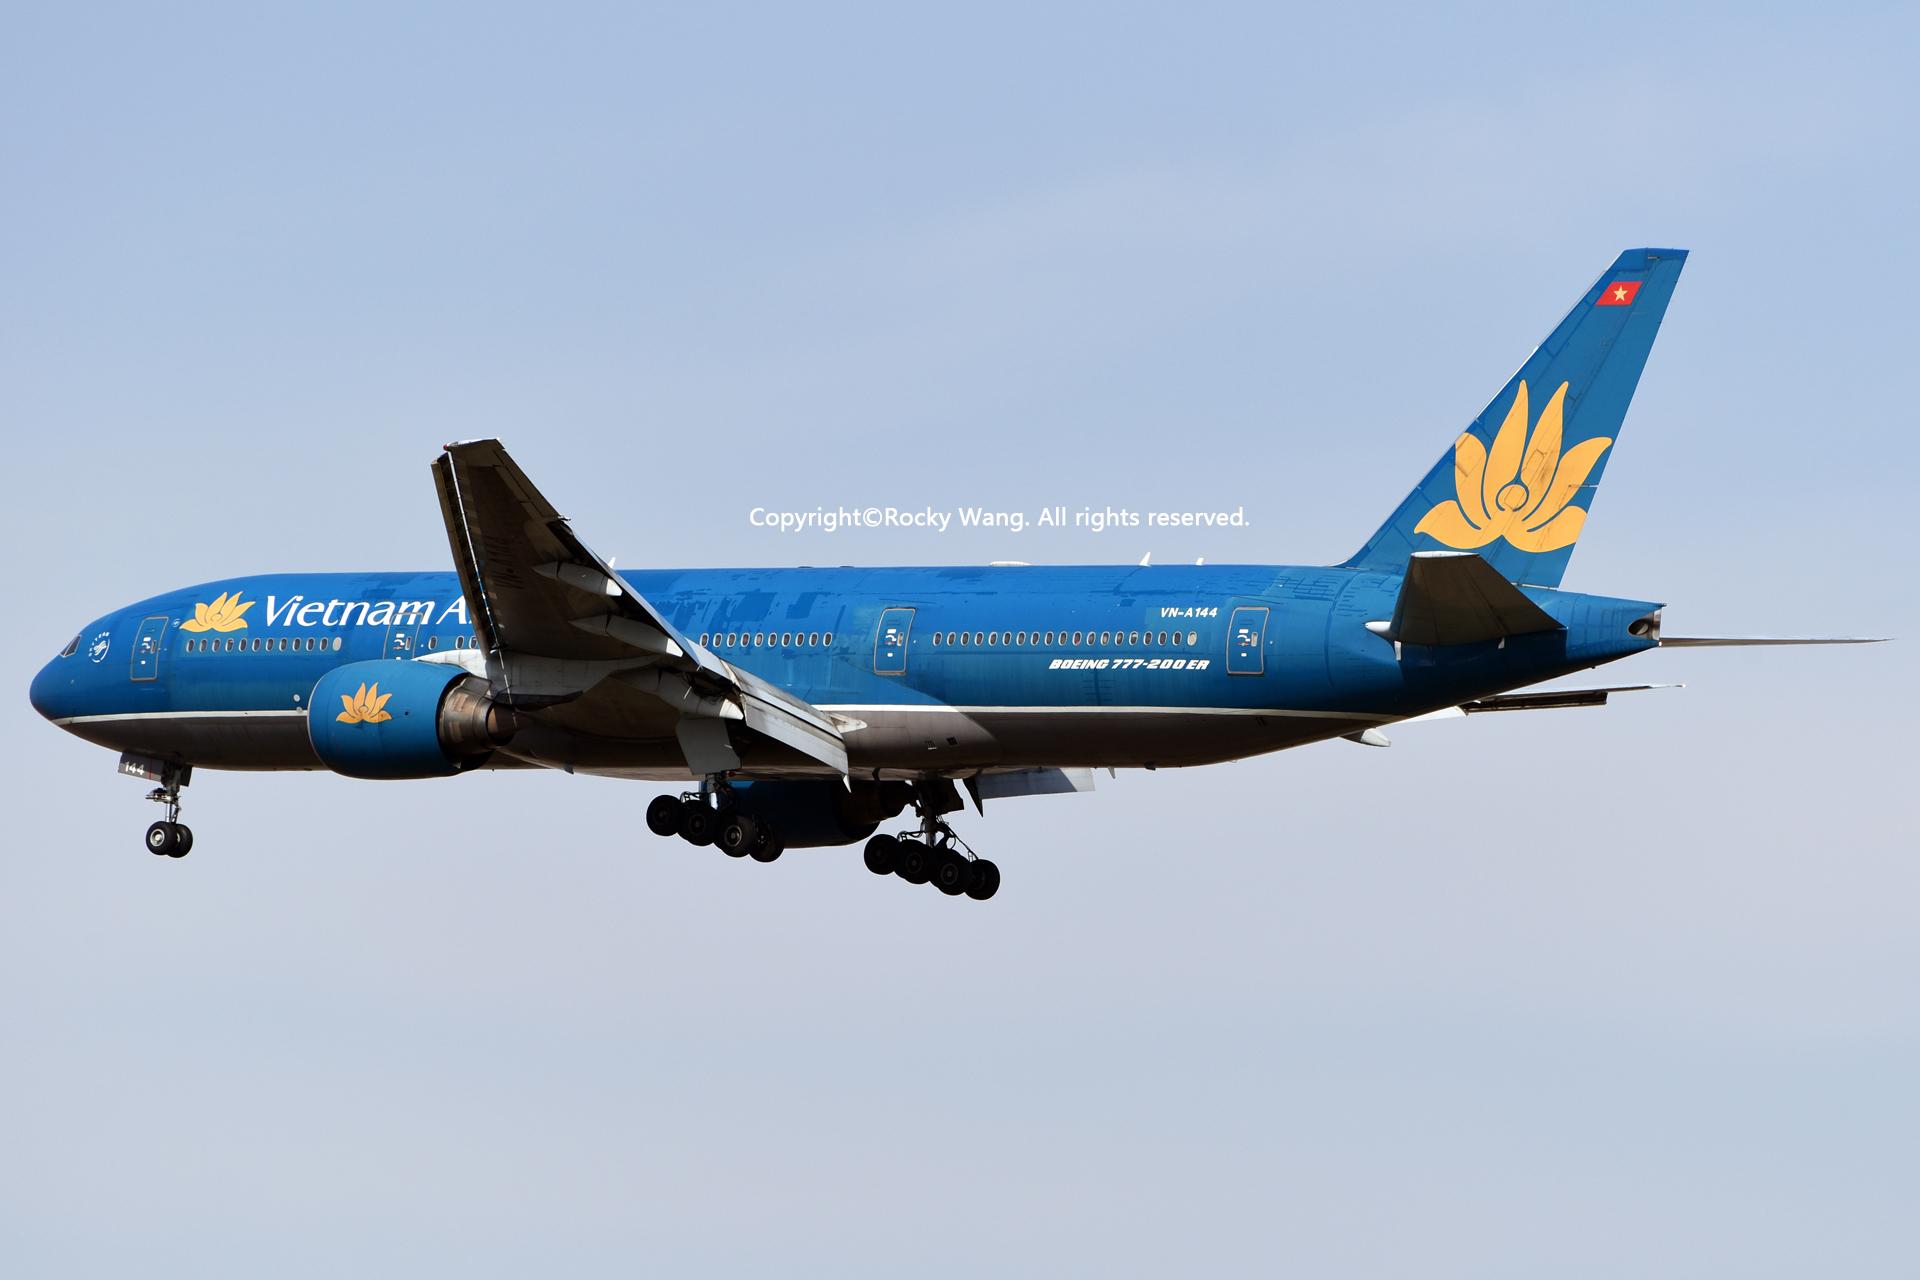 Re:[原创]居家了 批量处理老图 倾情奉献52家777 BOEING 777-26K(ER) VN-A144 Shanghai Pudong